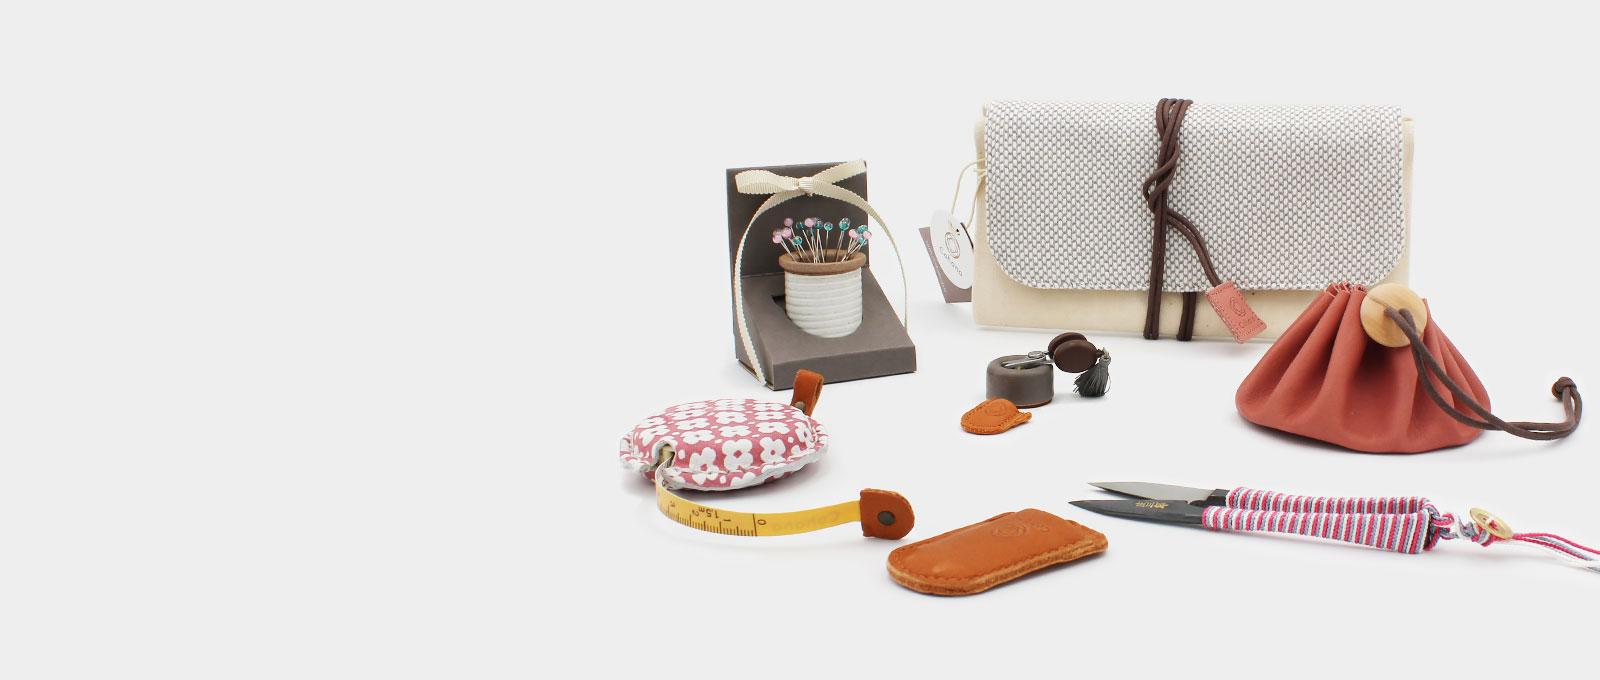 Cohana accessories